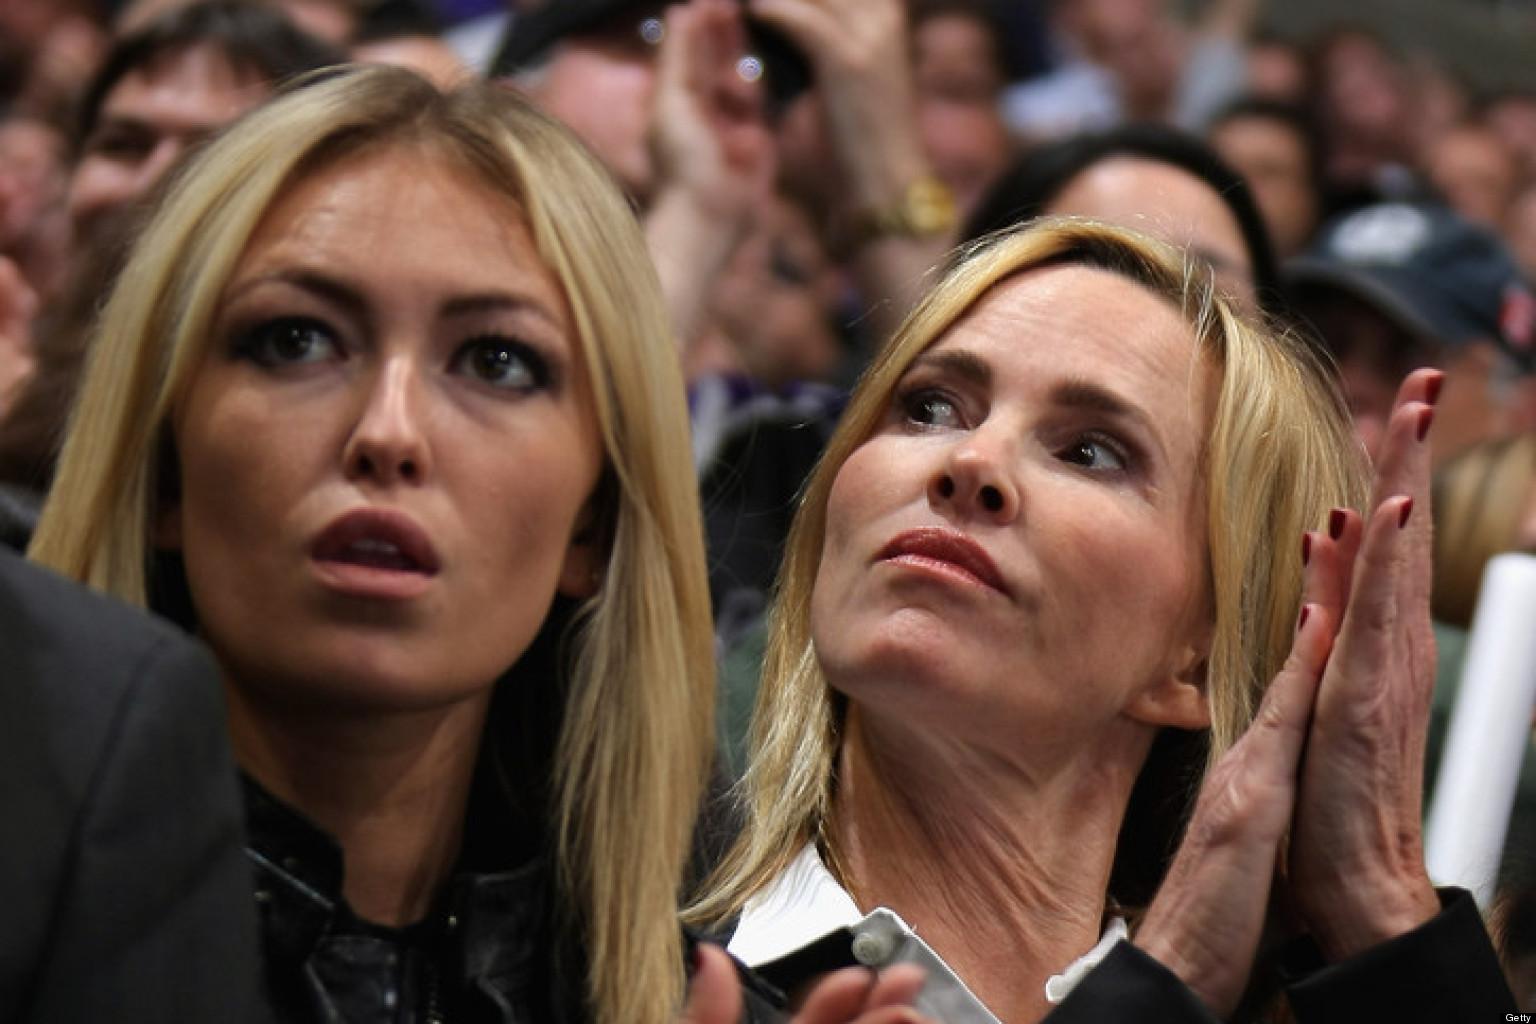 Paulina Gretzky Gets Her Bikini Ready Looks From Mom Janet